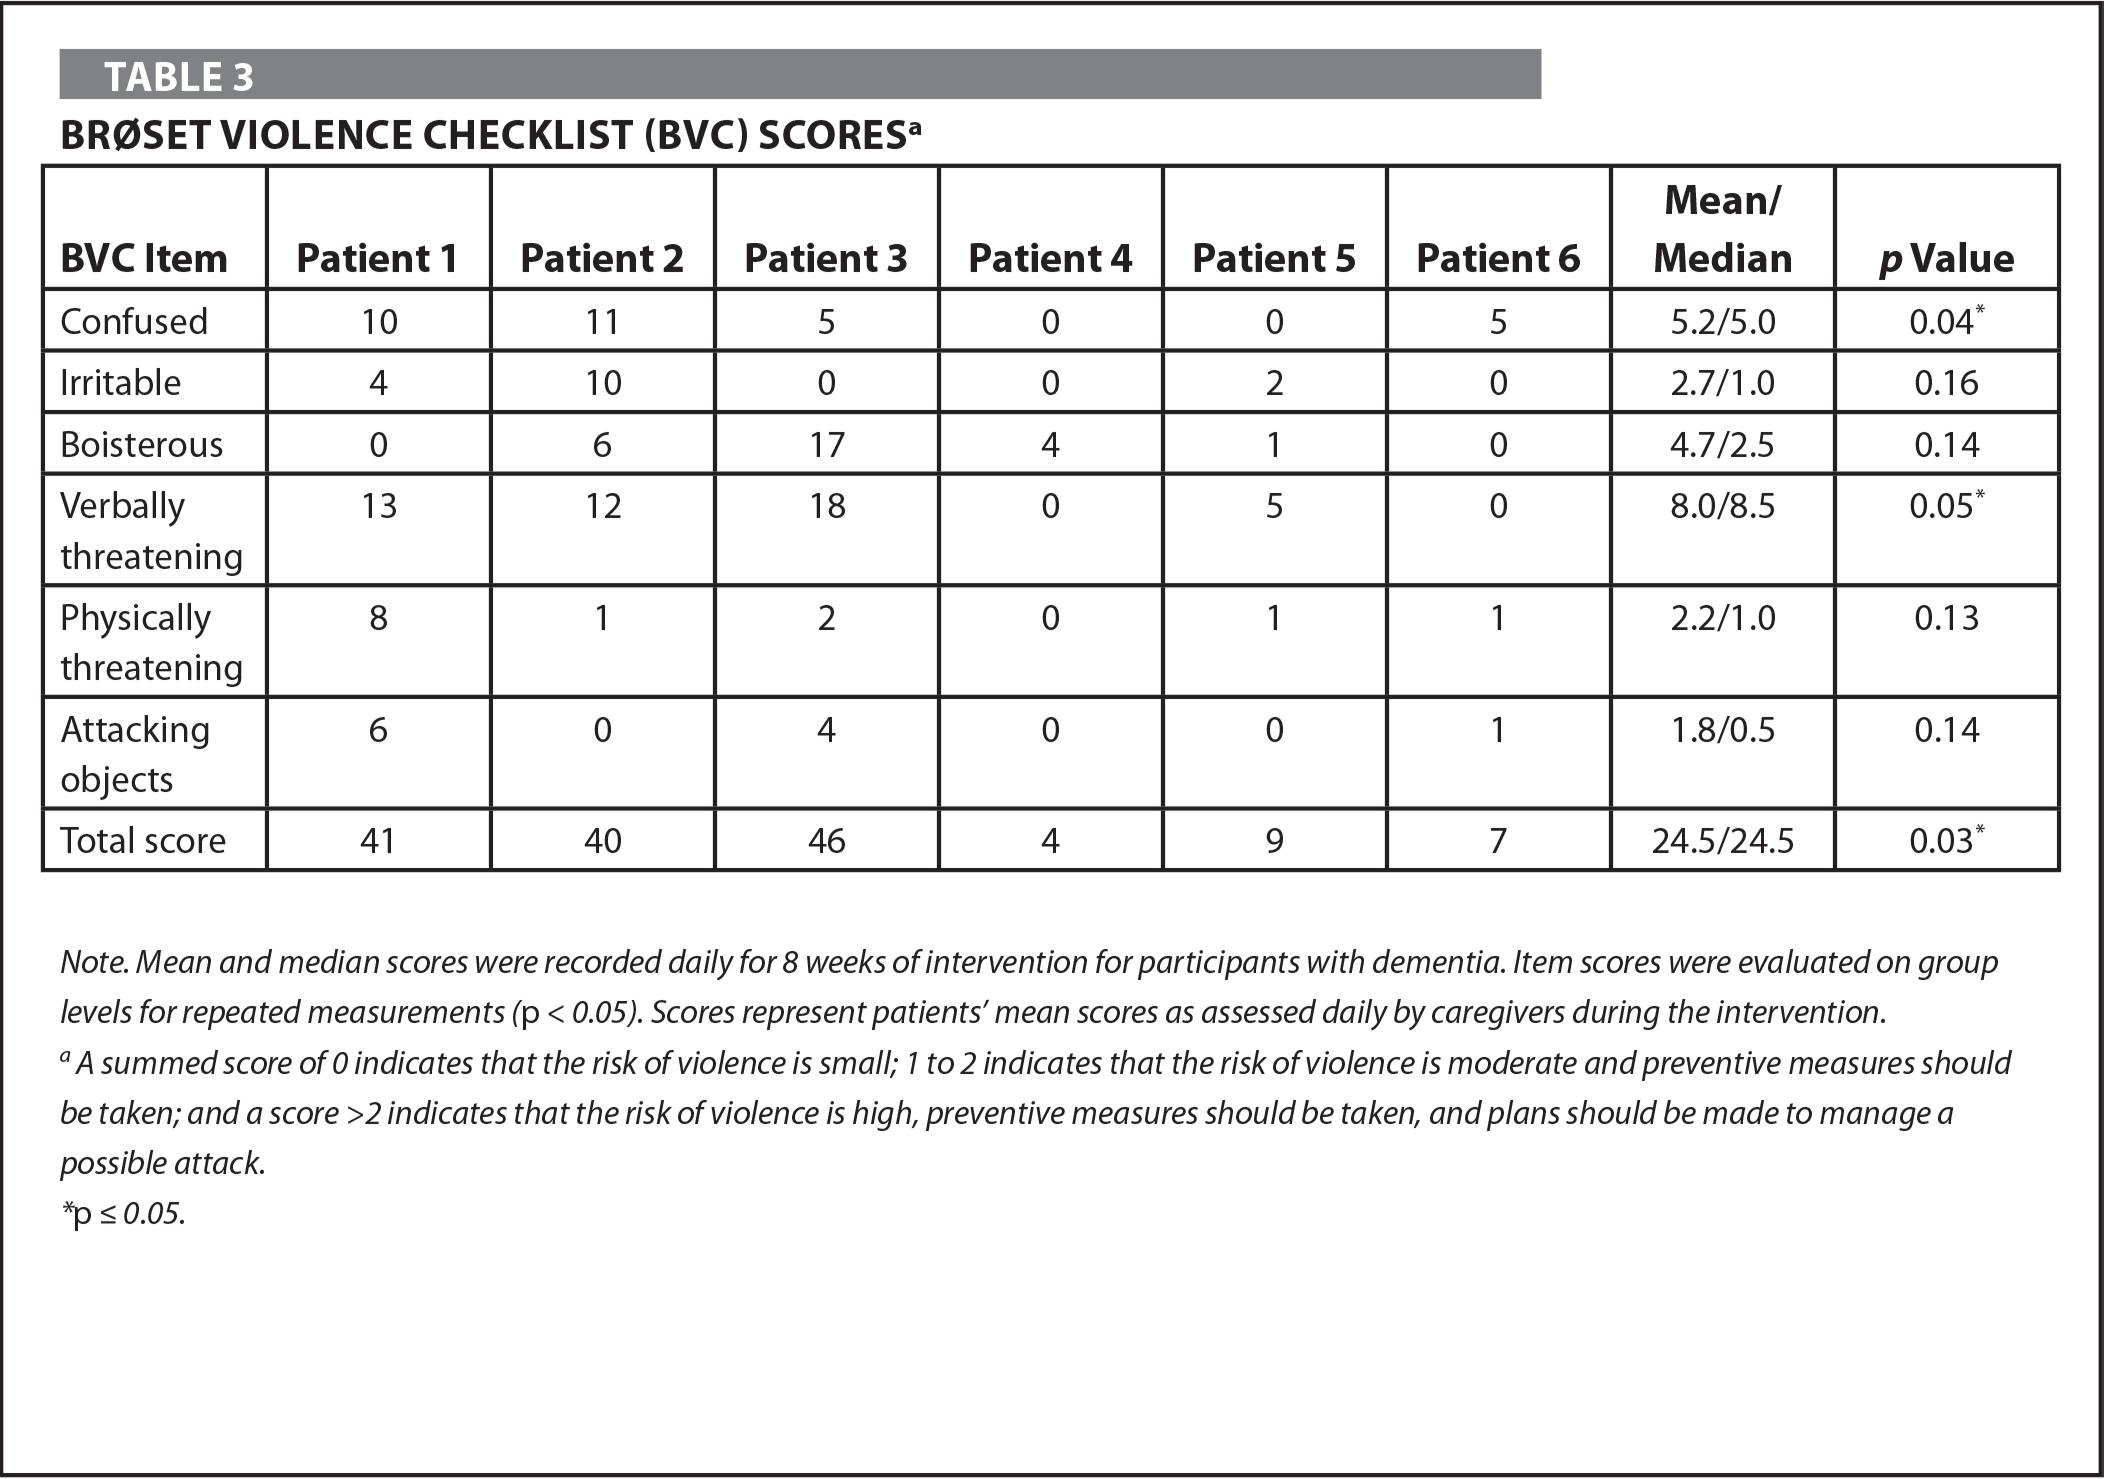 Brøset Violence Checklist (BVC) Scoresa